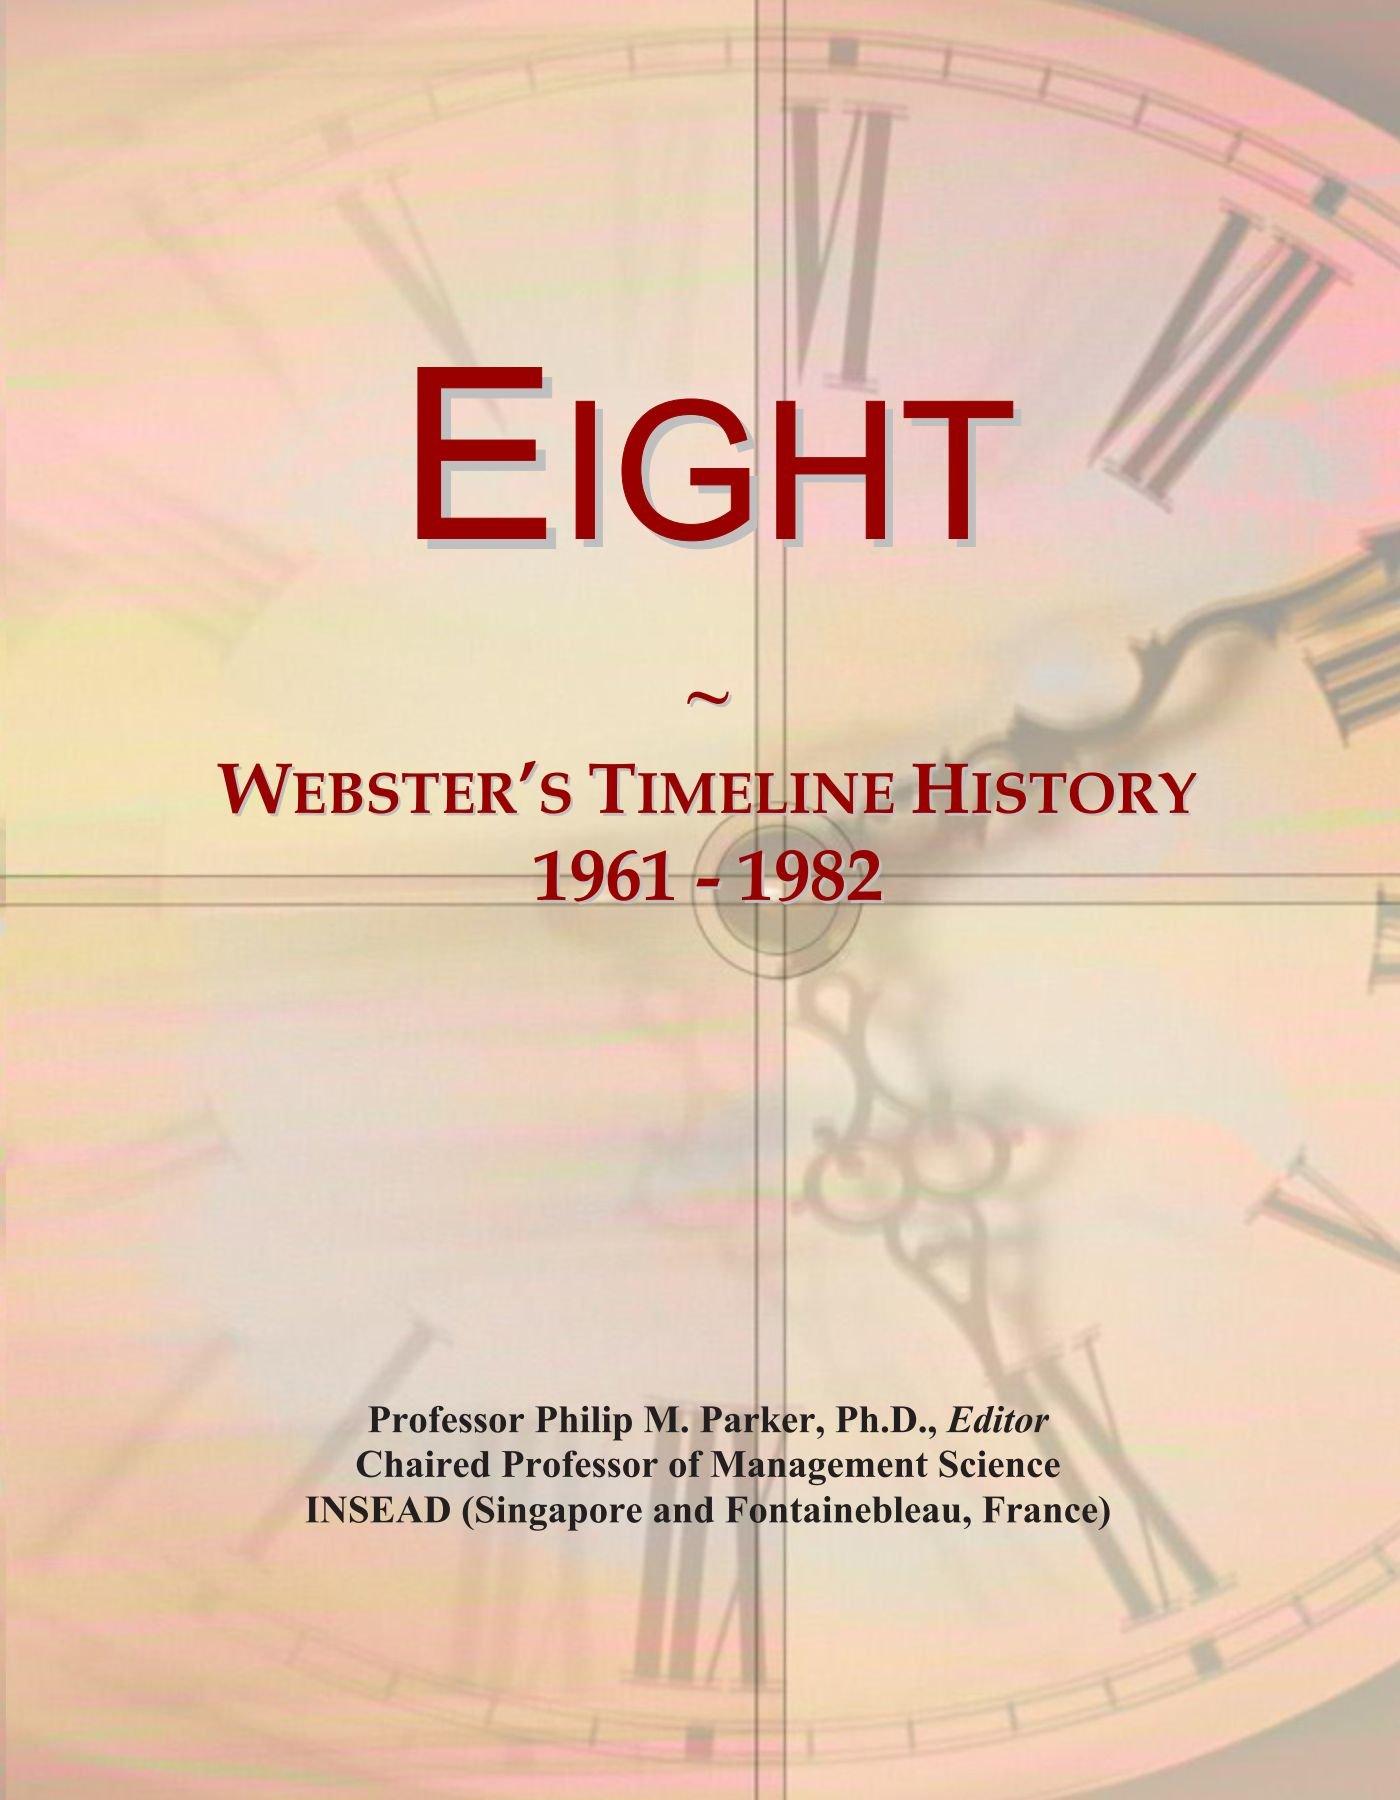 Eight: Webster's Timeline History, 1961 - 1982 ePub fb2 ebook